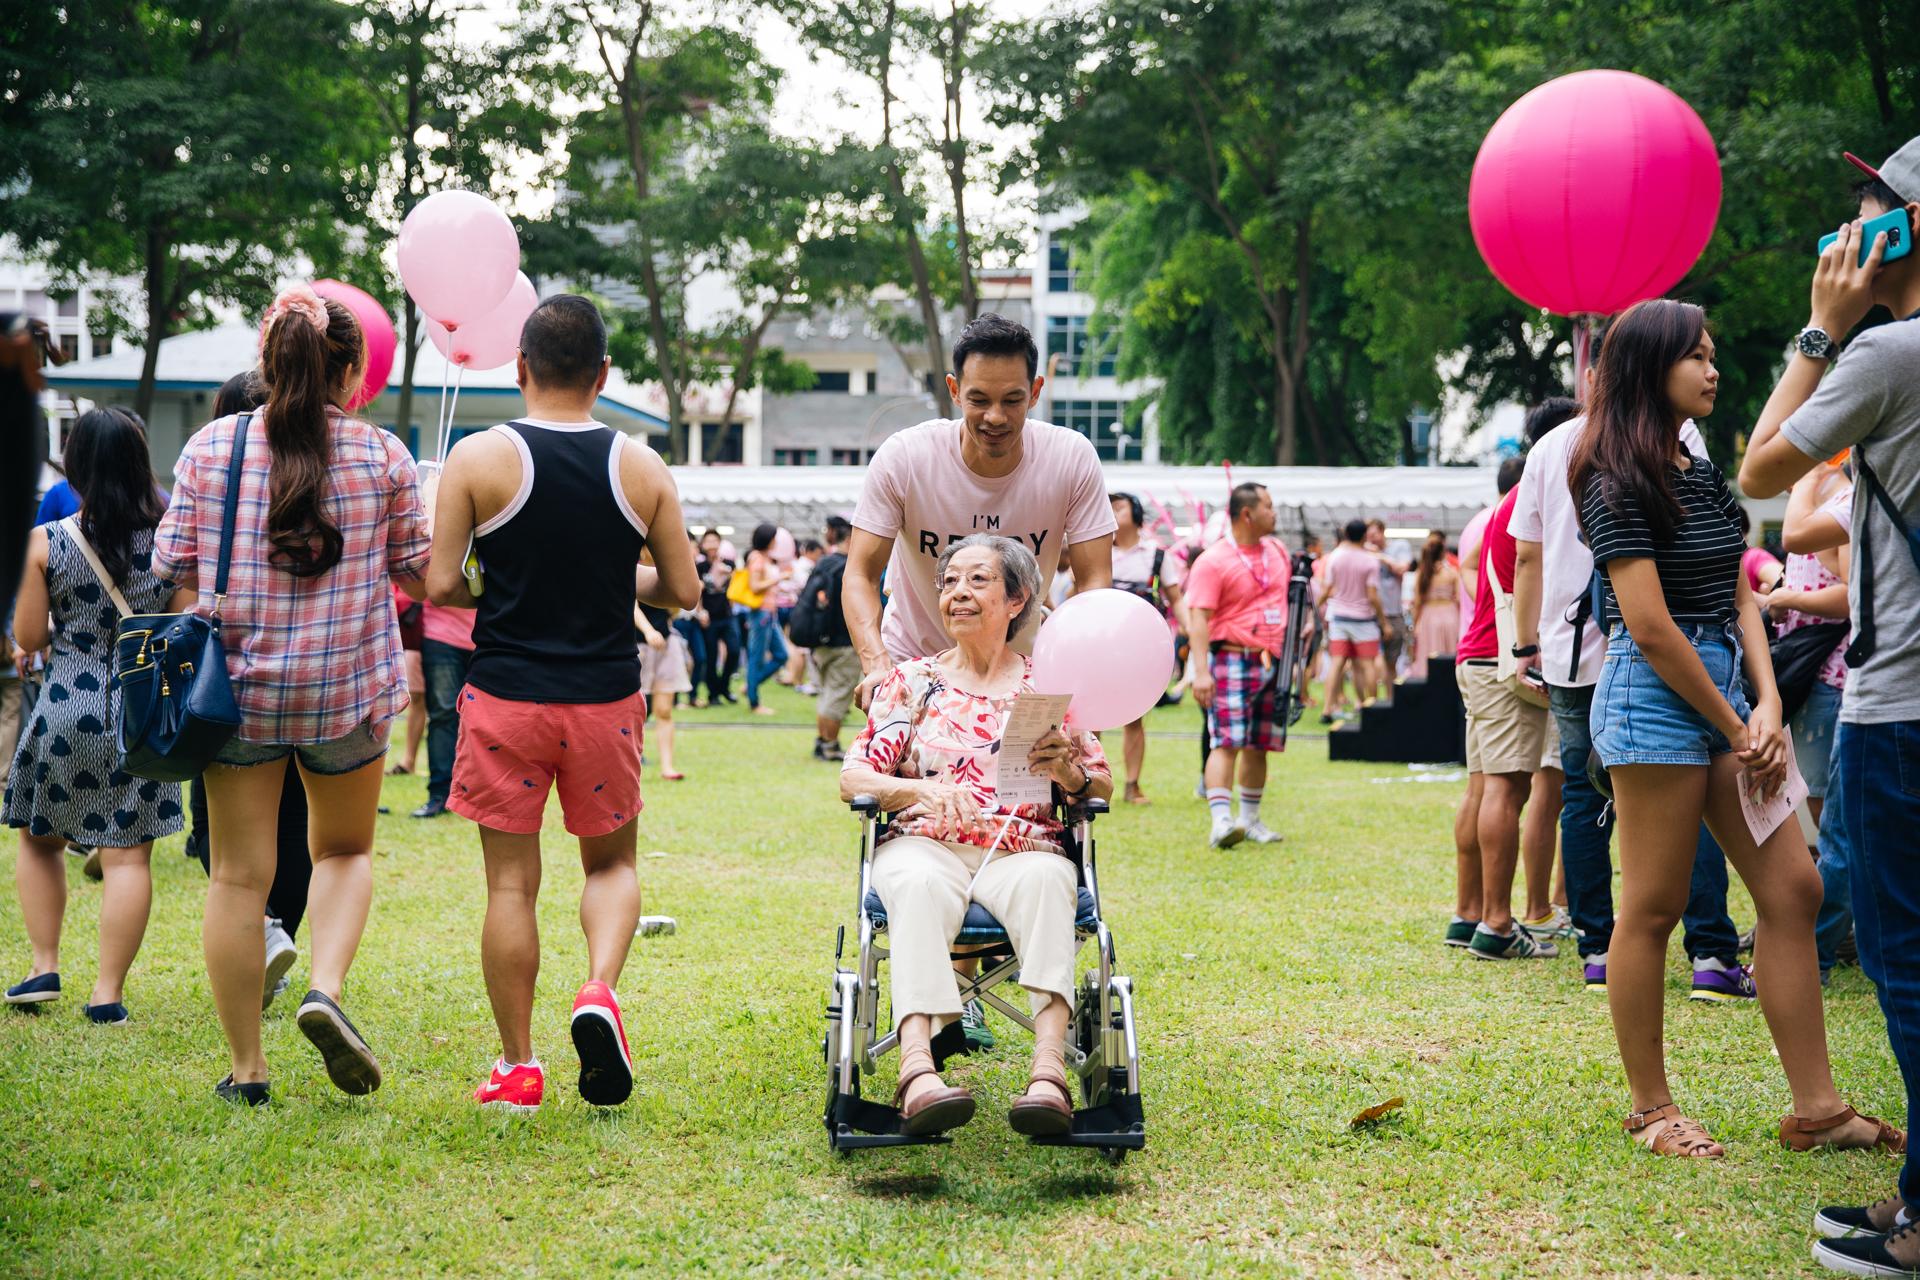 PinkDot Singapore 2015, Singapore (2015)